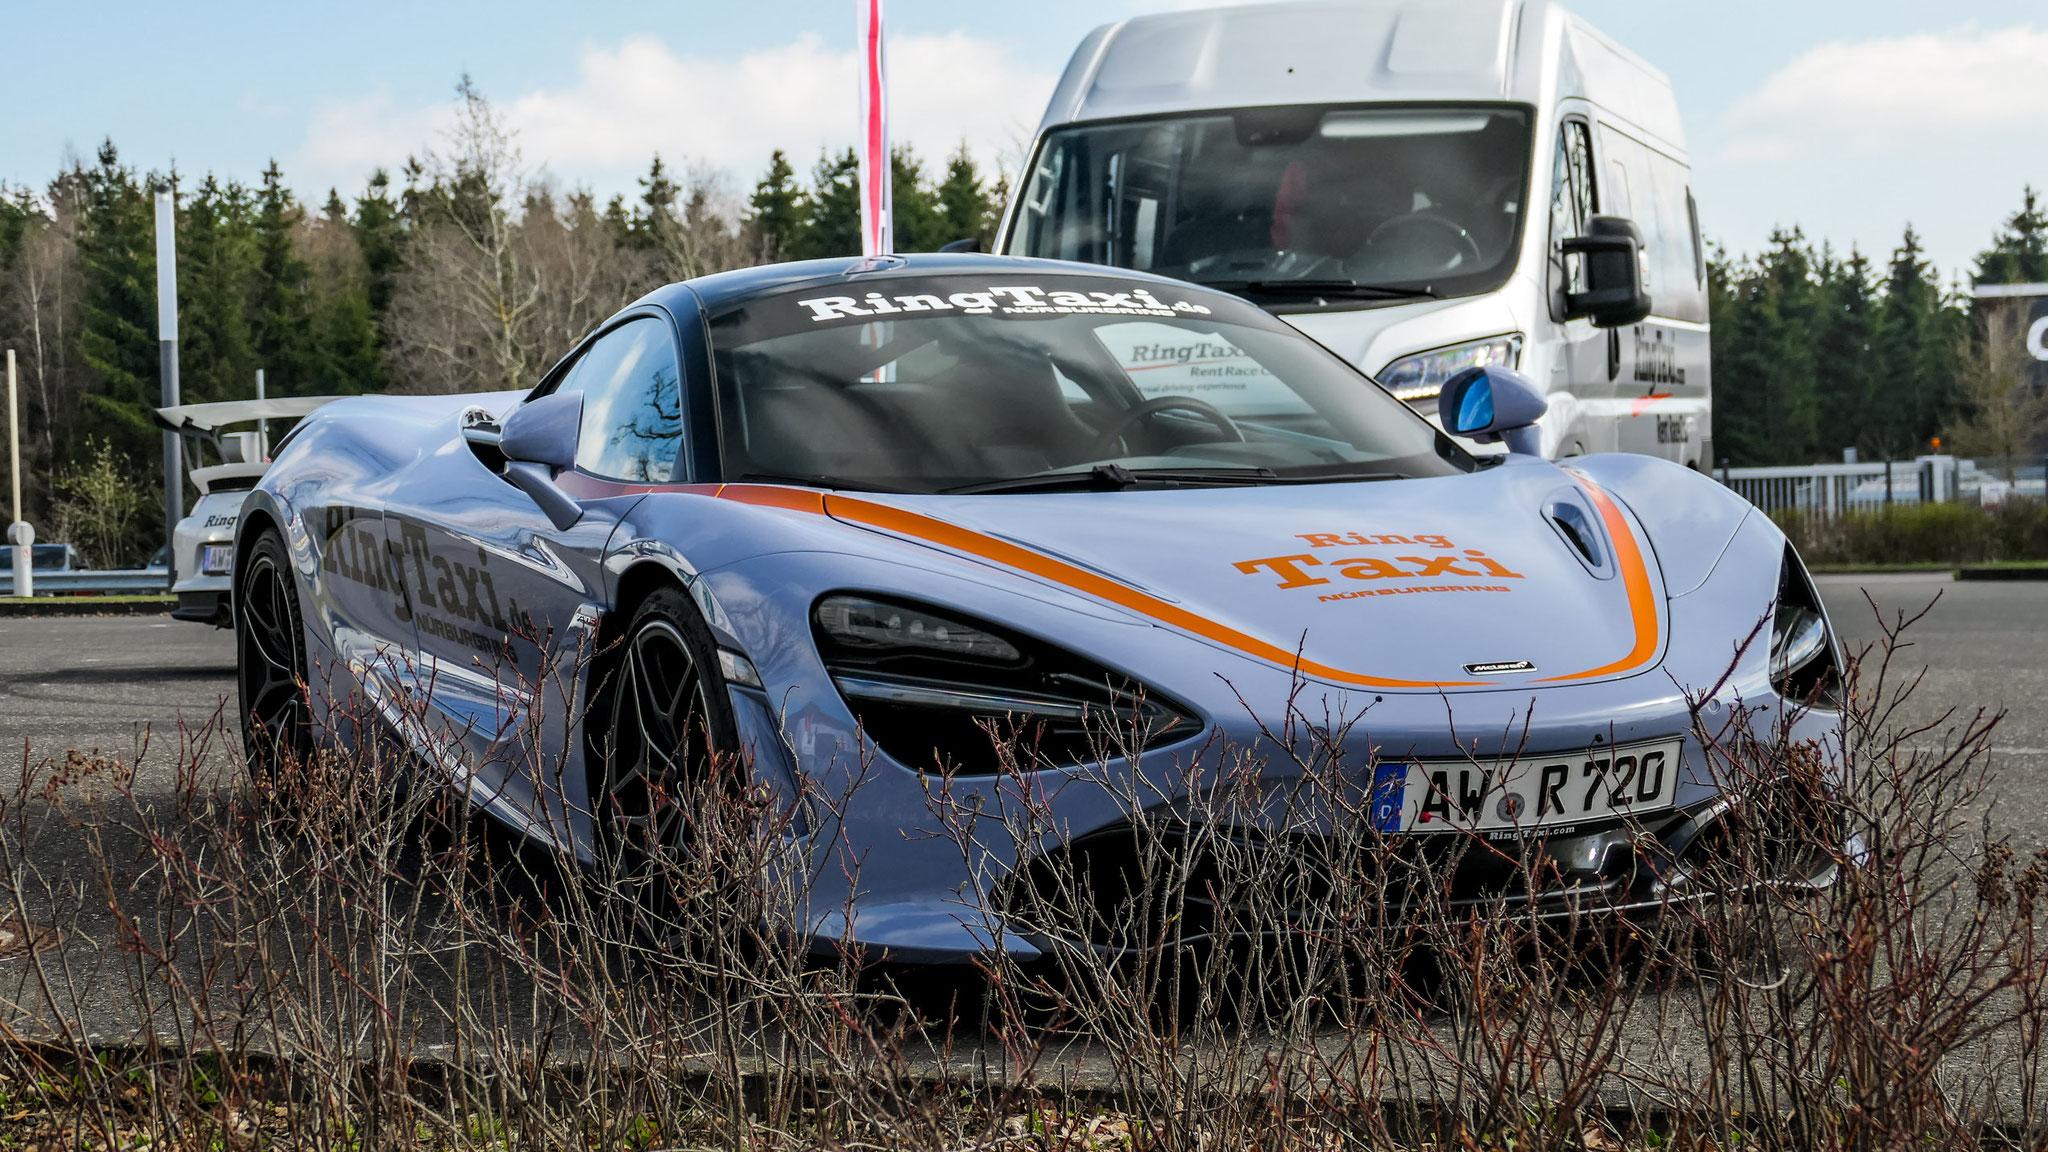 McLaren 720S - AW-R-720